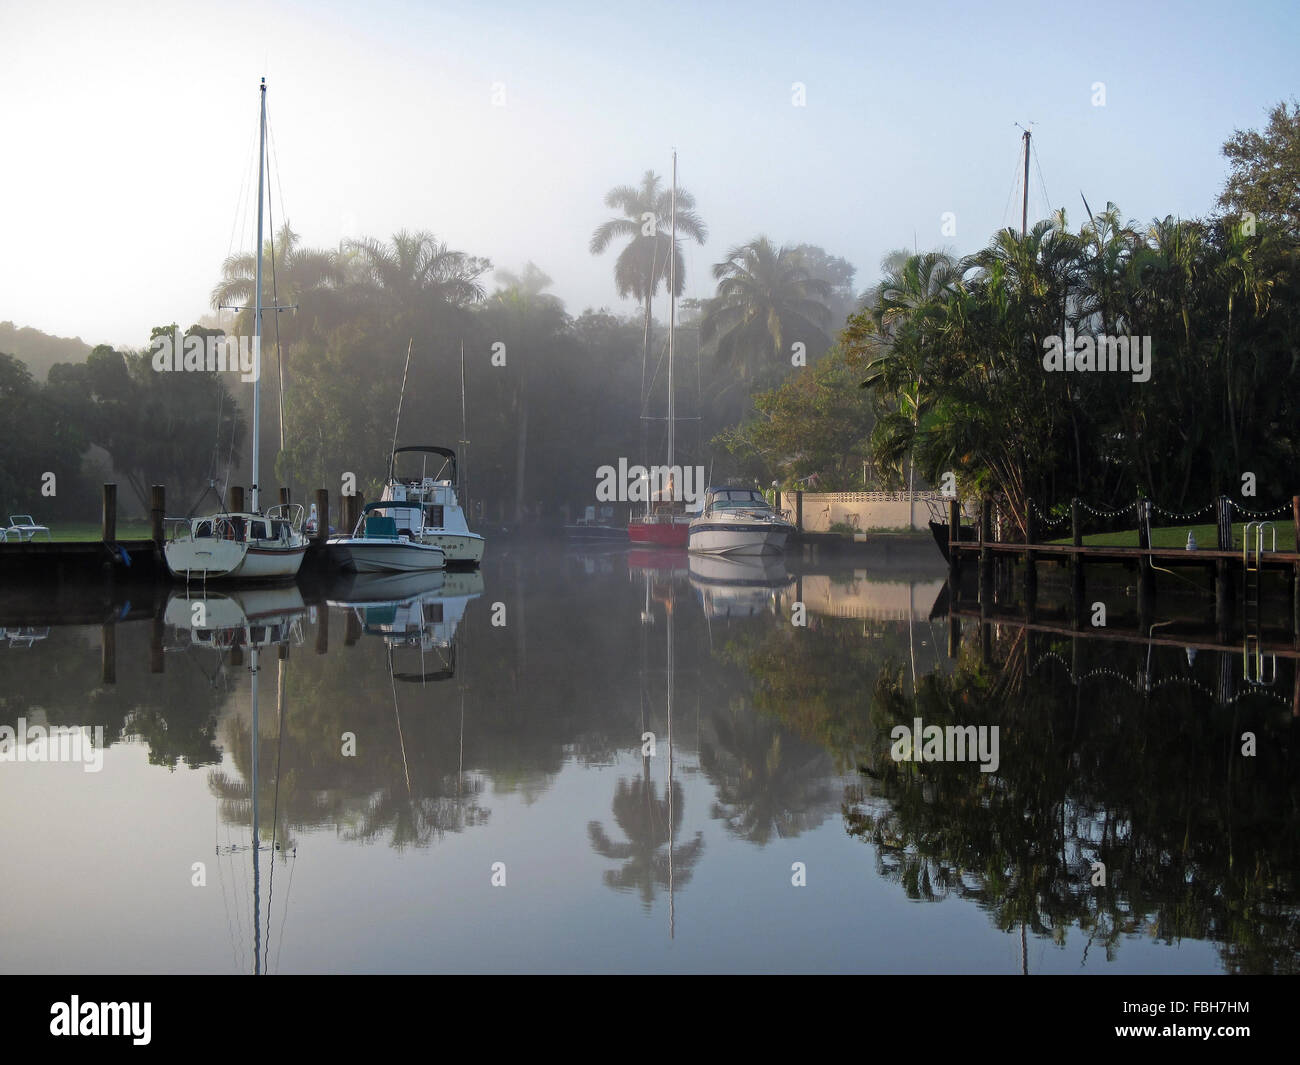 Foggy sunrise amidst yachts on New River, Fort Lauderdale, Florida Stock Photo